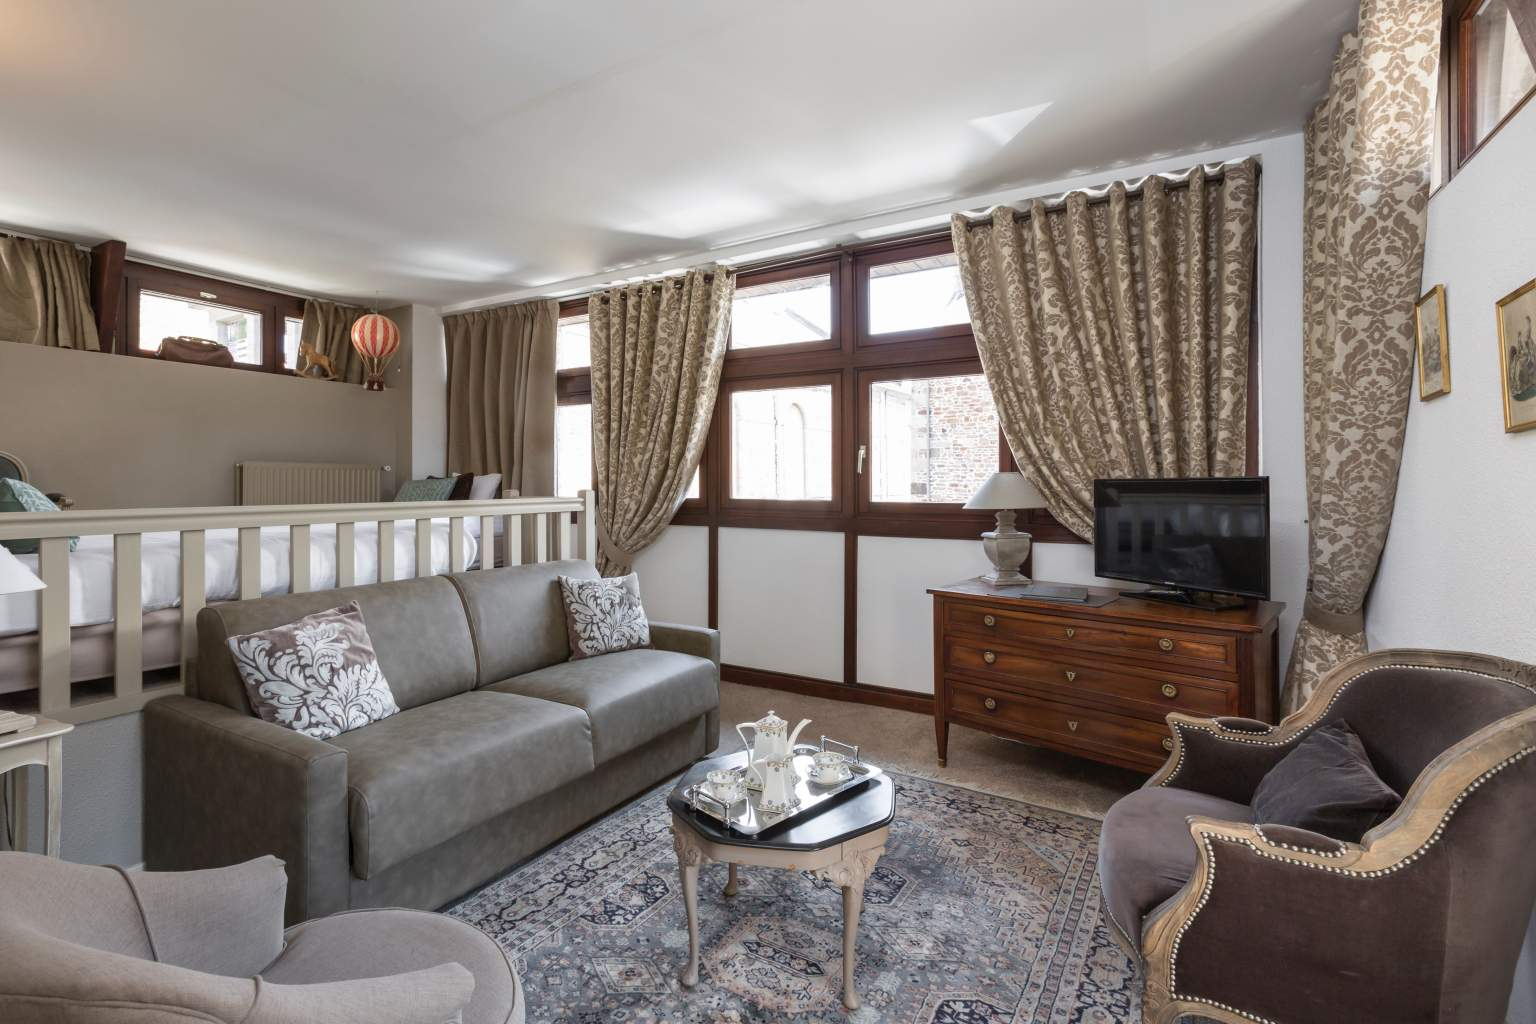 suite deluxe hotel arvor dinan Brittany France